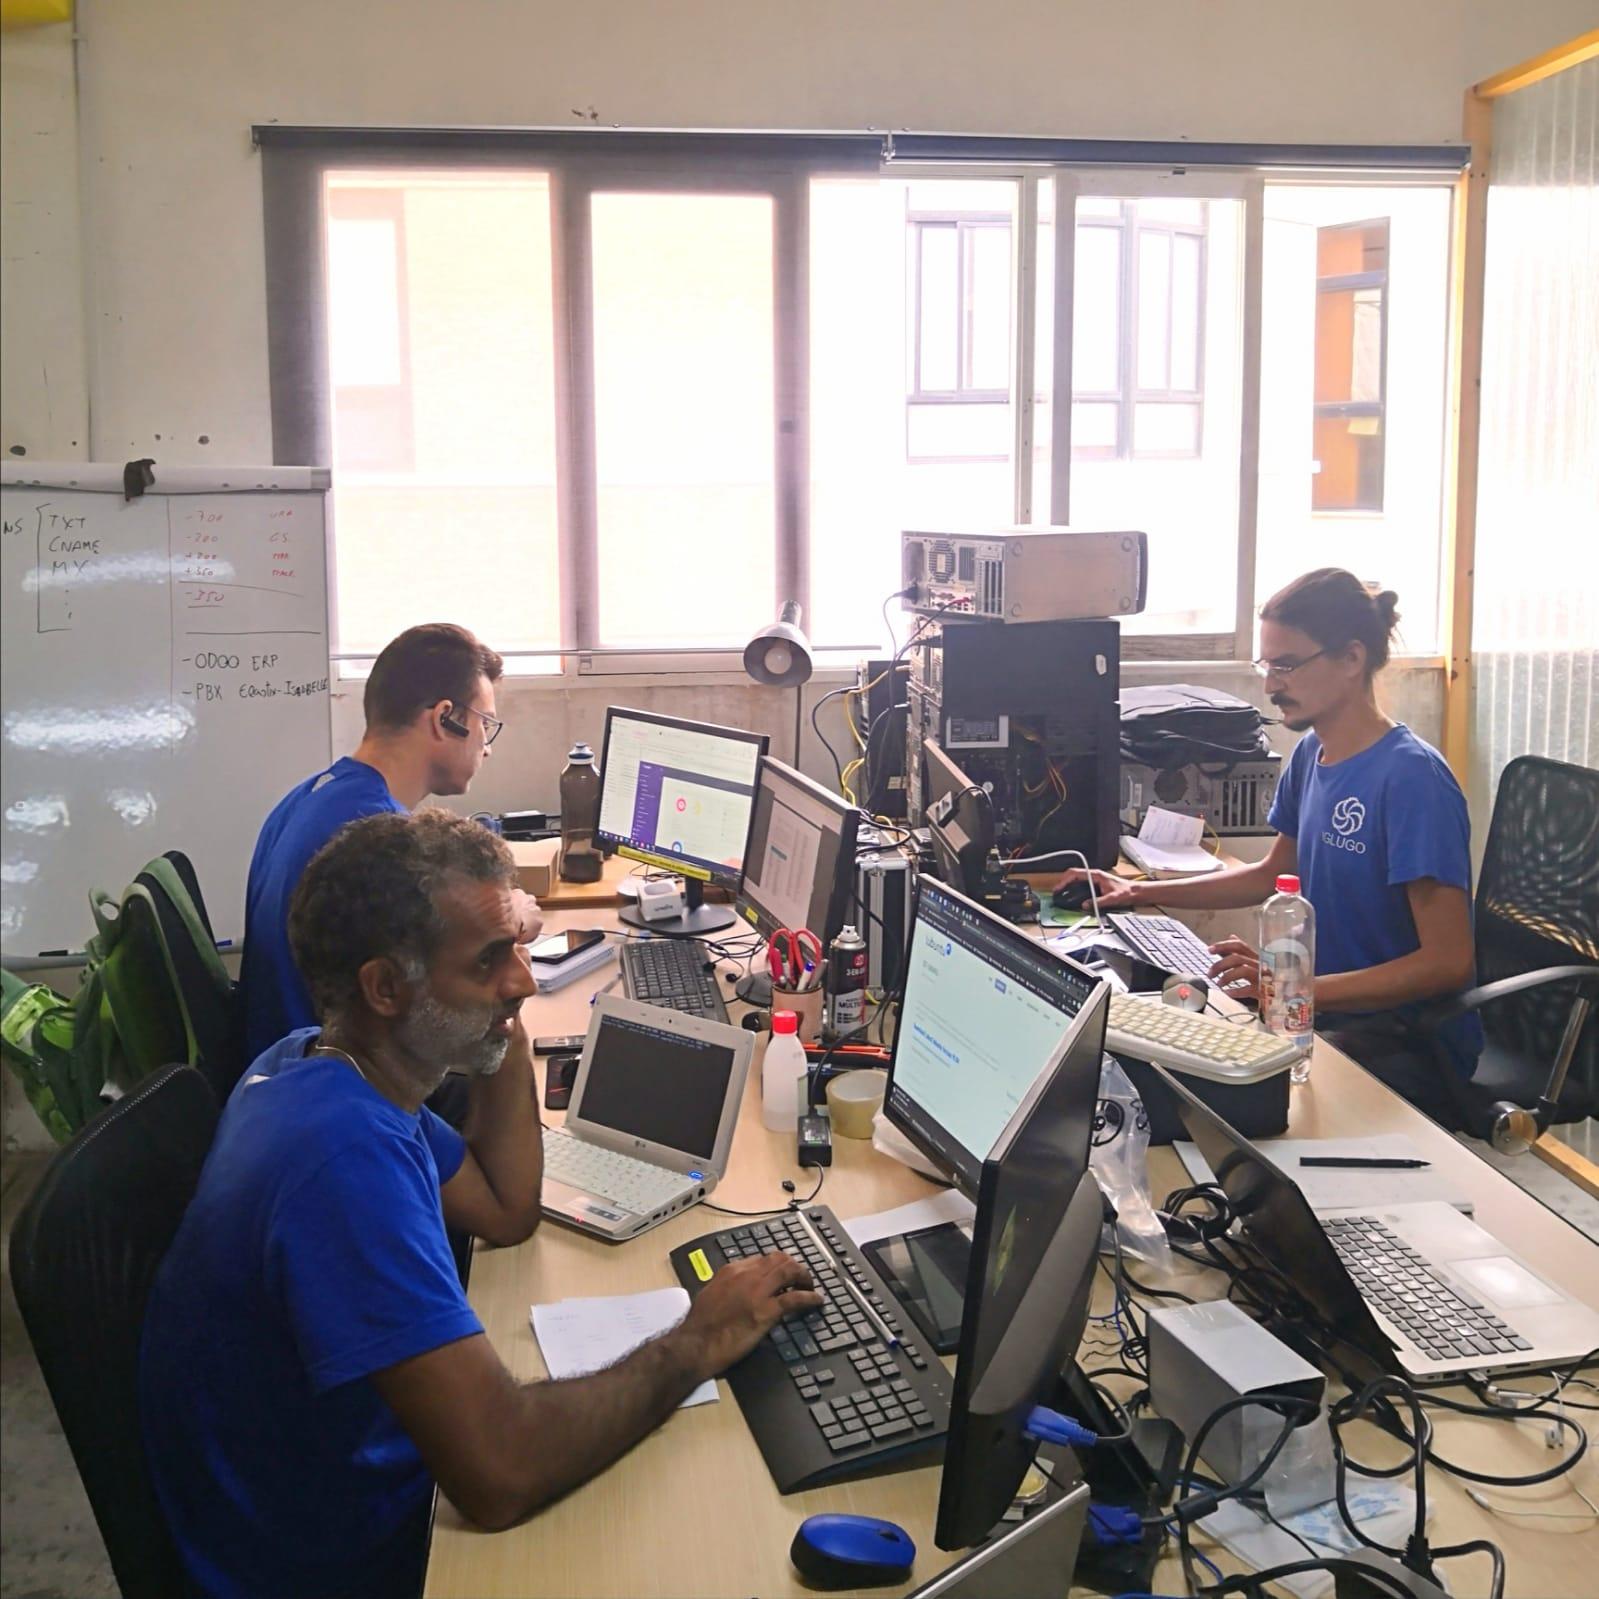 iglugo_team_ in the office